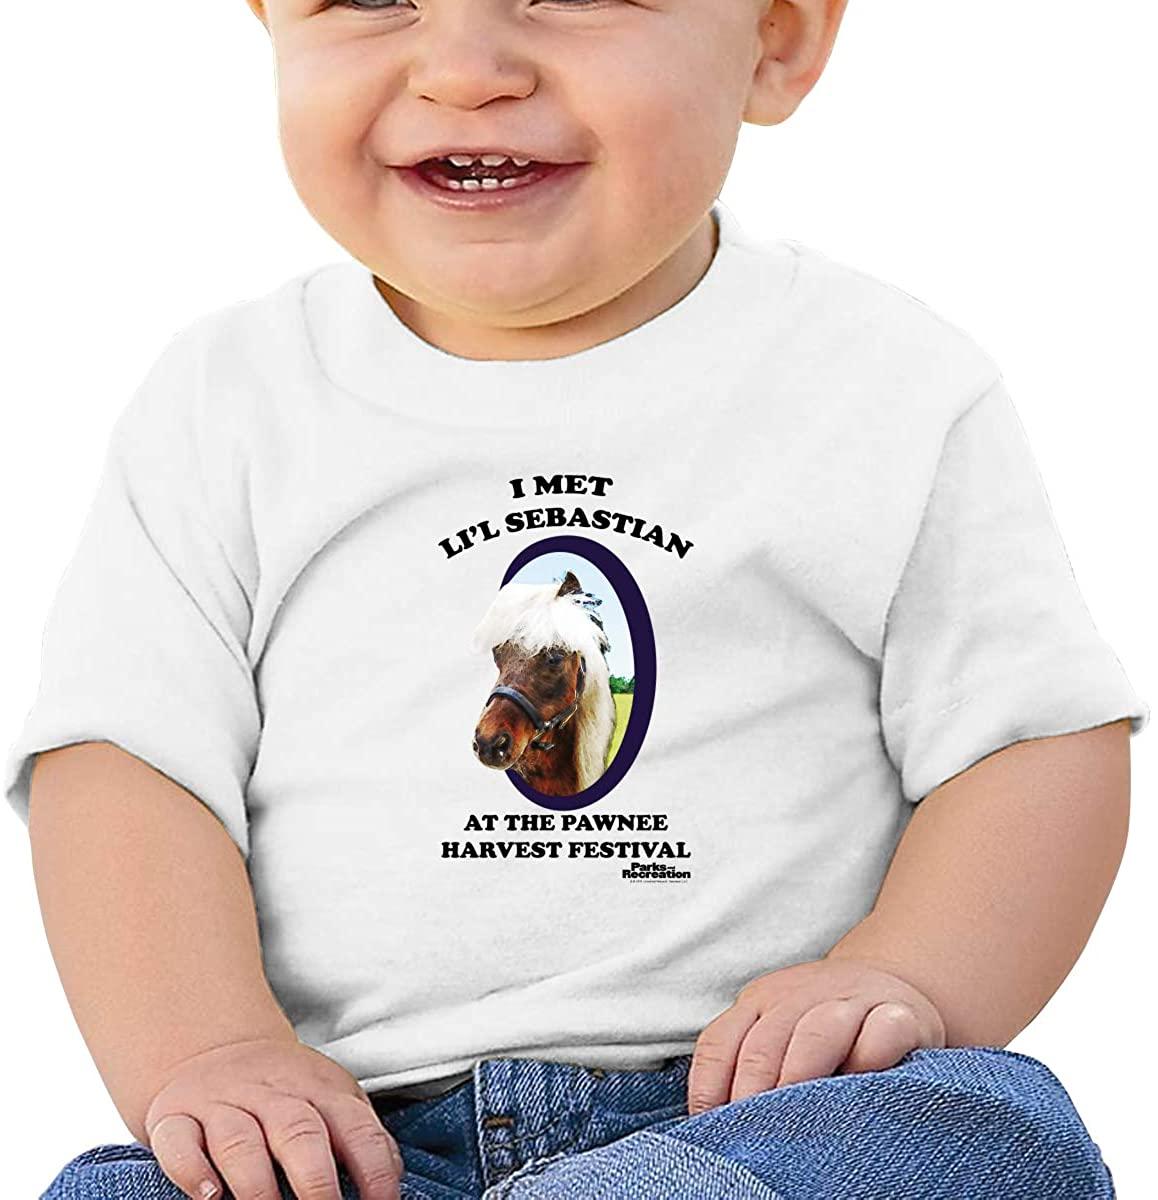 Andea Parks & Recreation Li'L Sebastian Soft and Comfortable Cotton Baby Short-Sleeved T-Shirt